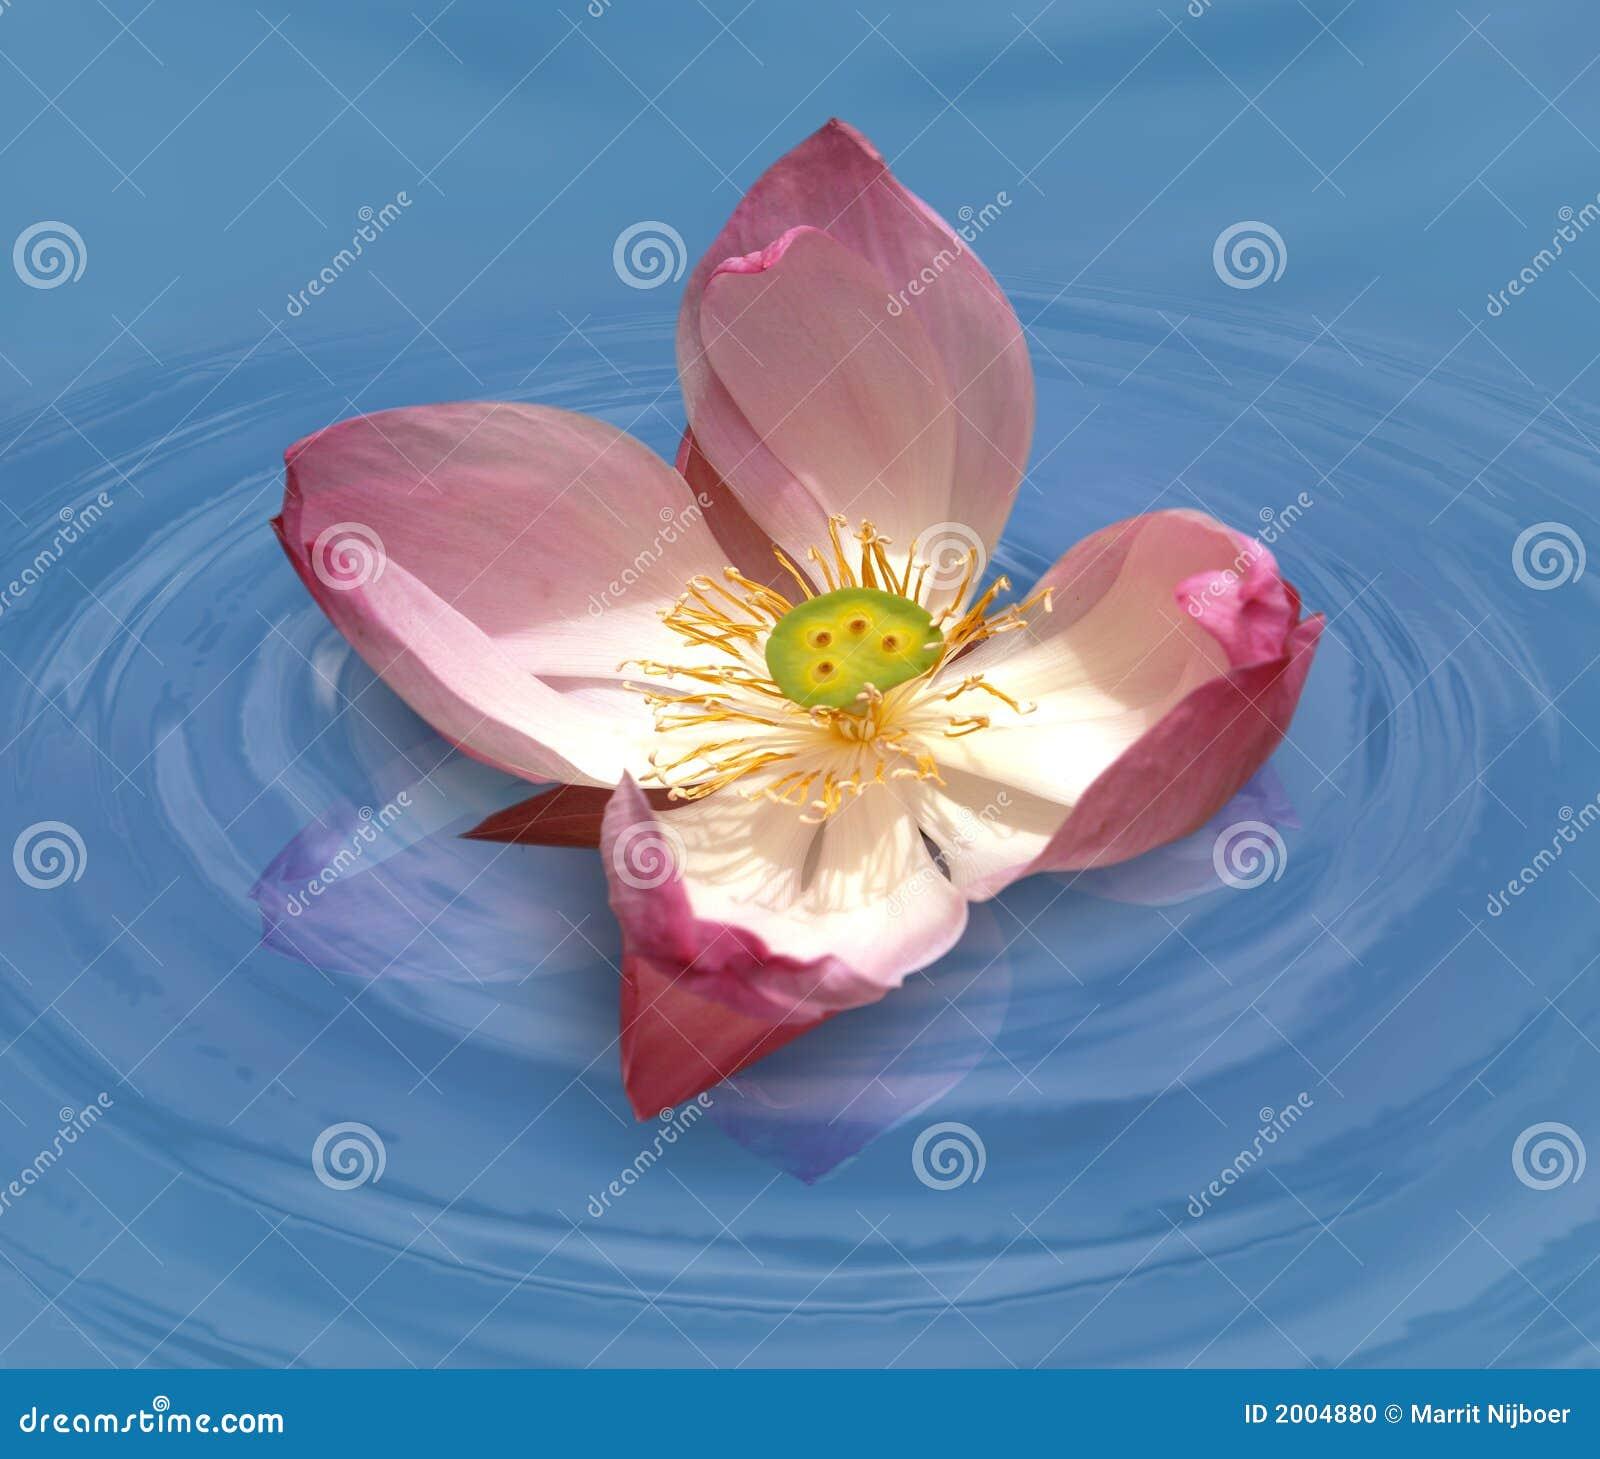 lotus in water stock photo  image, Beautiful flower